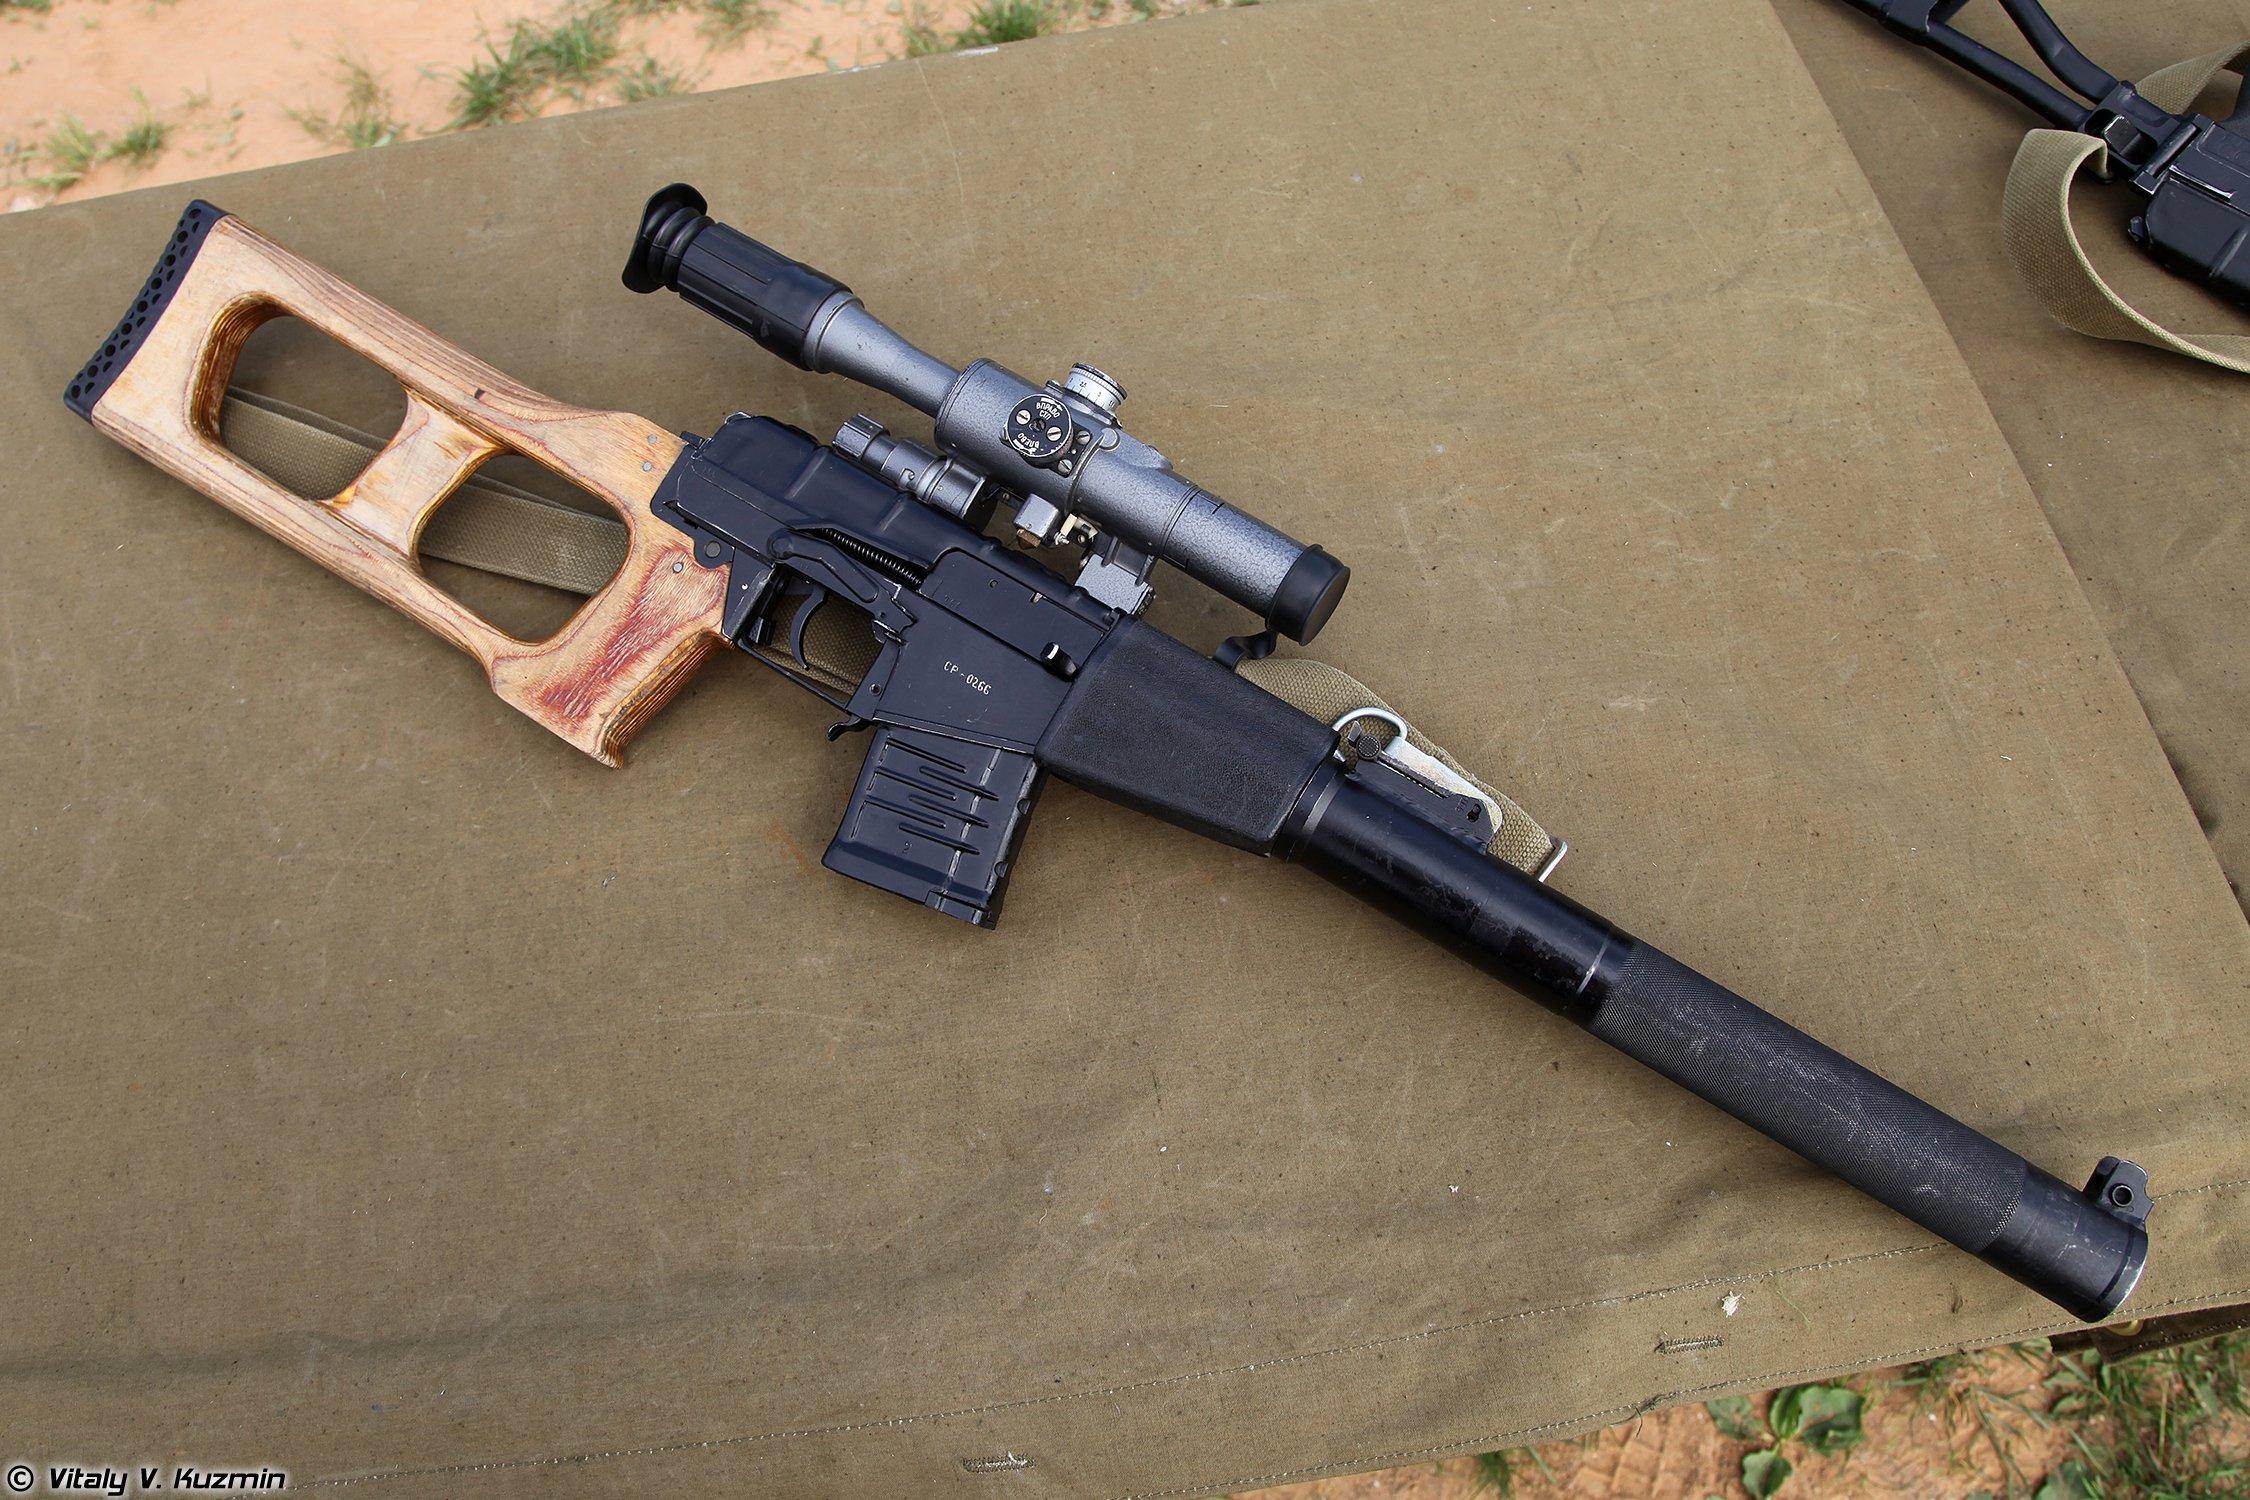 Rifles Of Russian Army Hd Wallpaper: 1 VSS Vintorez Sniper Rifle HD Wallpapers